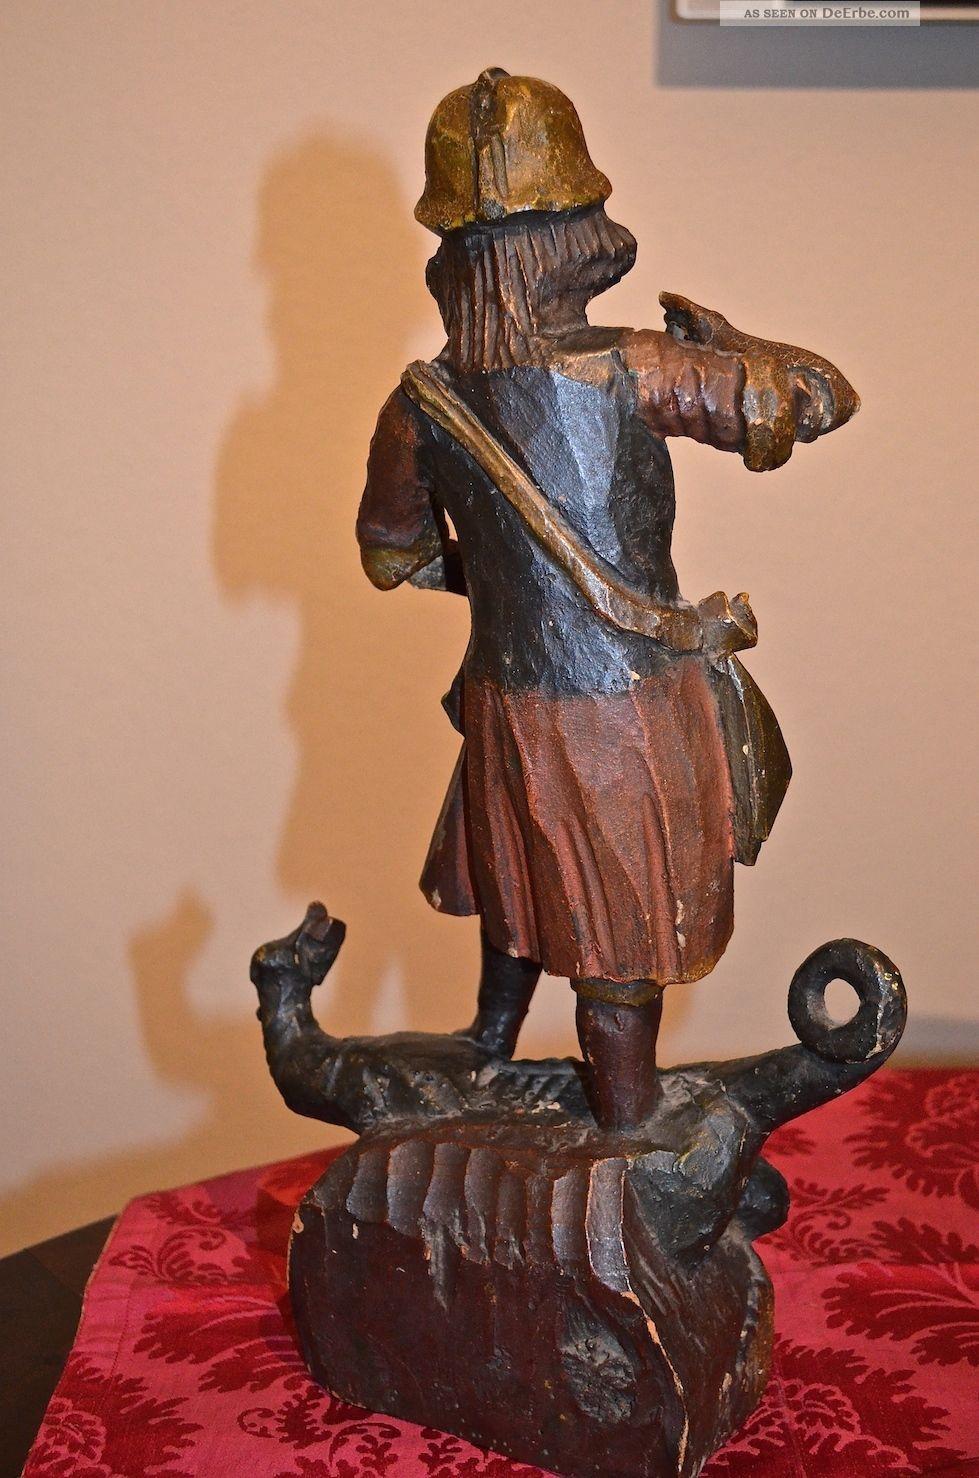 Metallobjekte Holz Skulptur Heiliger Georg Bronze